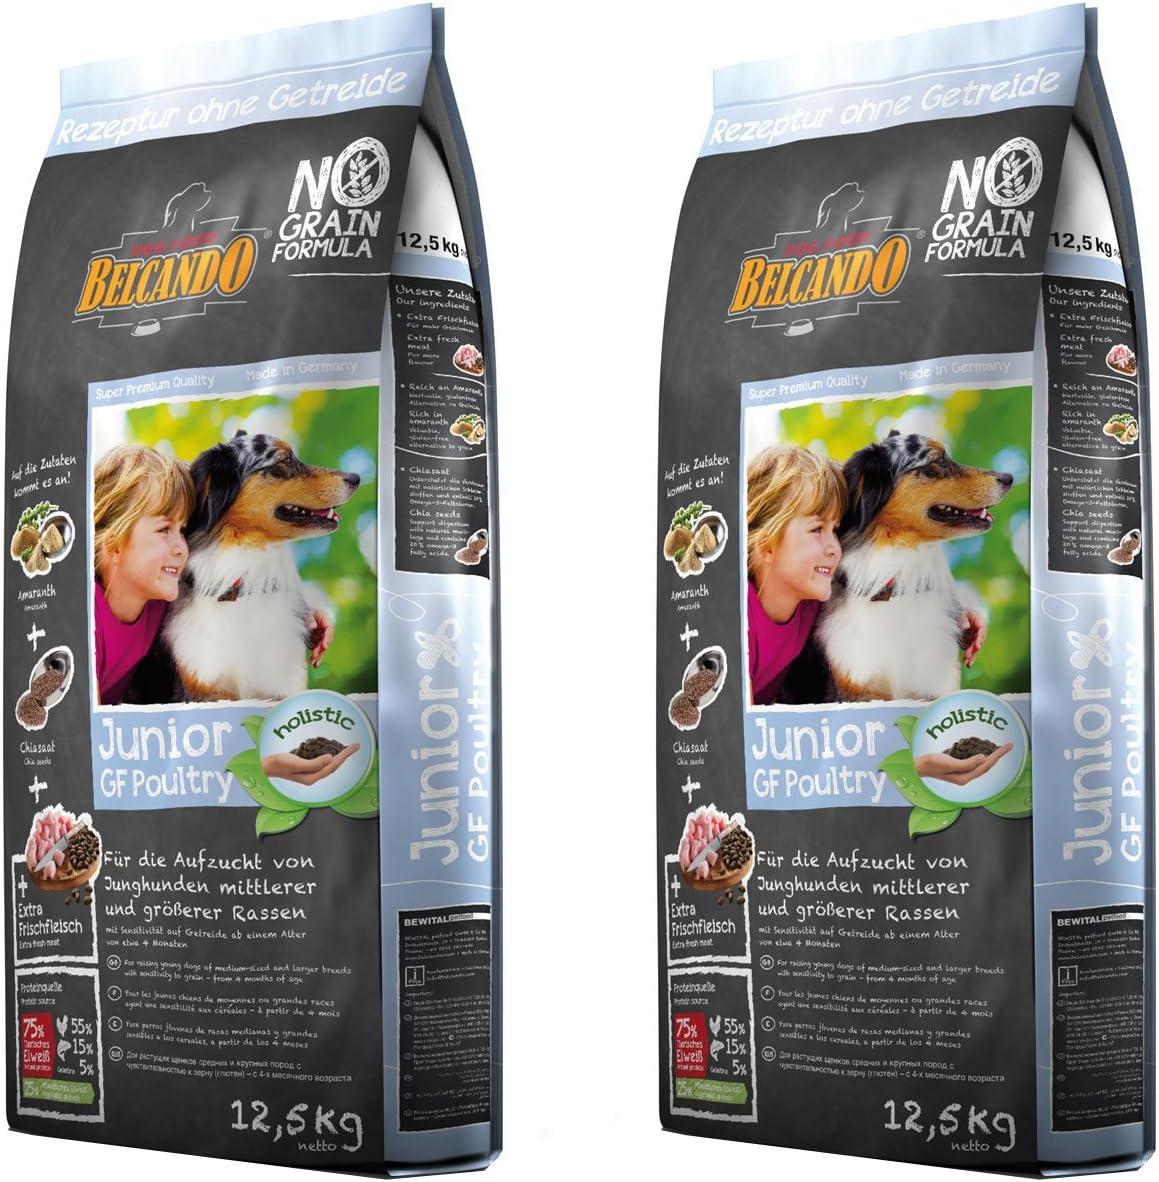 2x 12,5kg belcando Junior GF Poultry getreidefreies Perros Forro Cachorro, Puppy